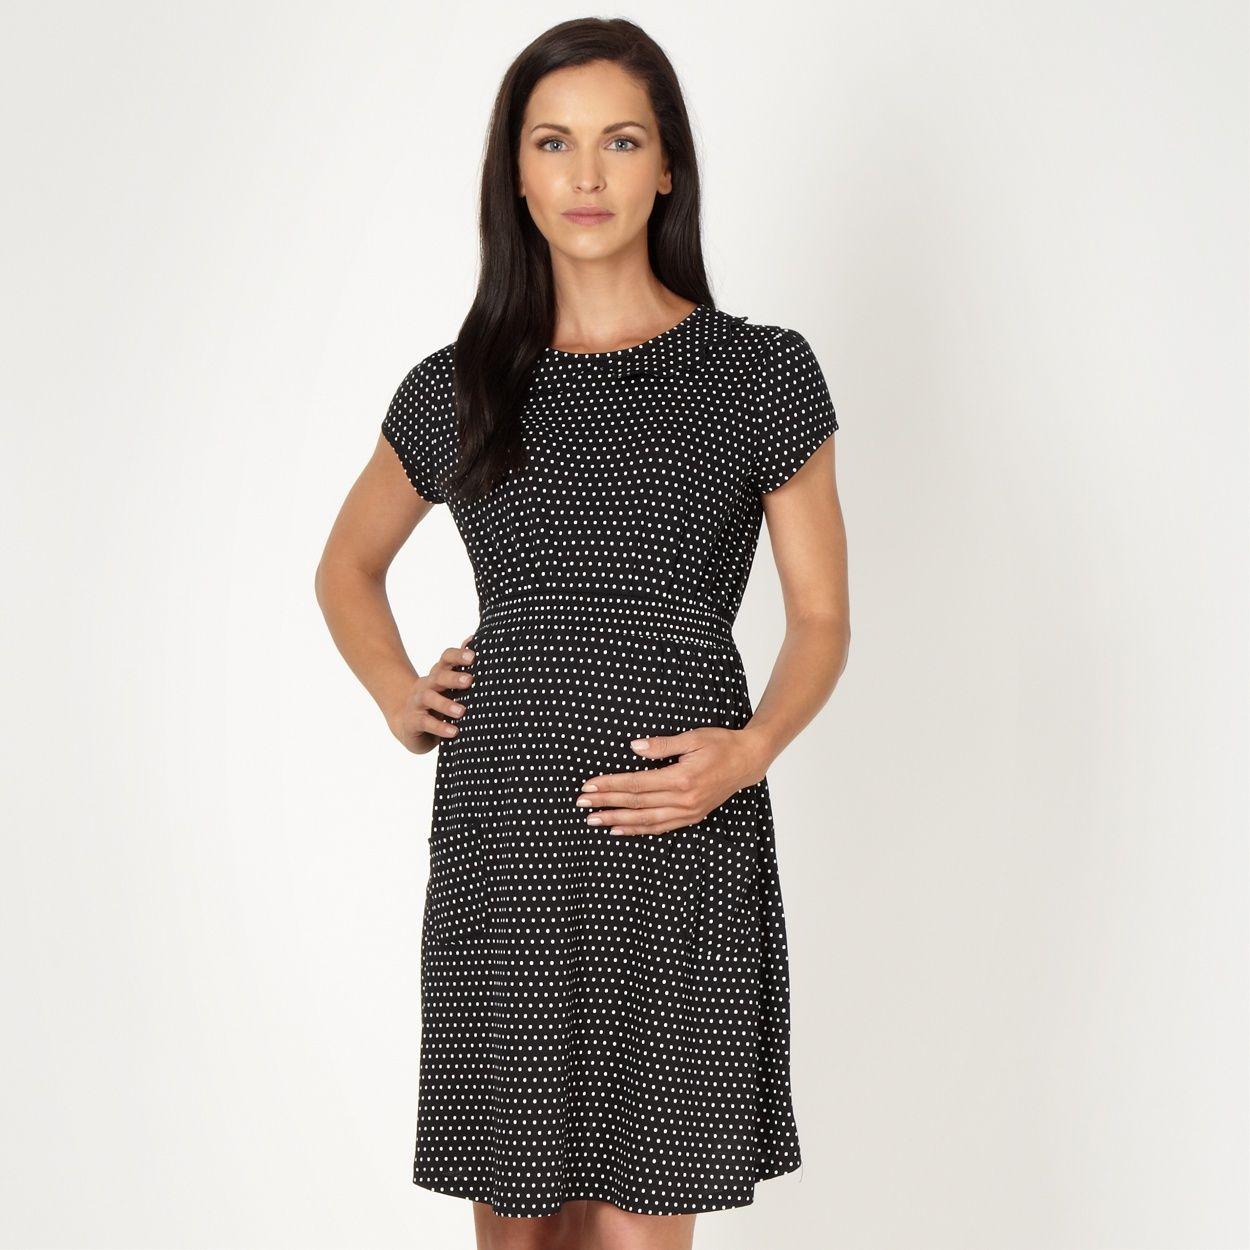 41704d117b1f4 Red Herring Maternity black polka dot jersey maternity dress- at Debenhams .com